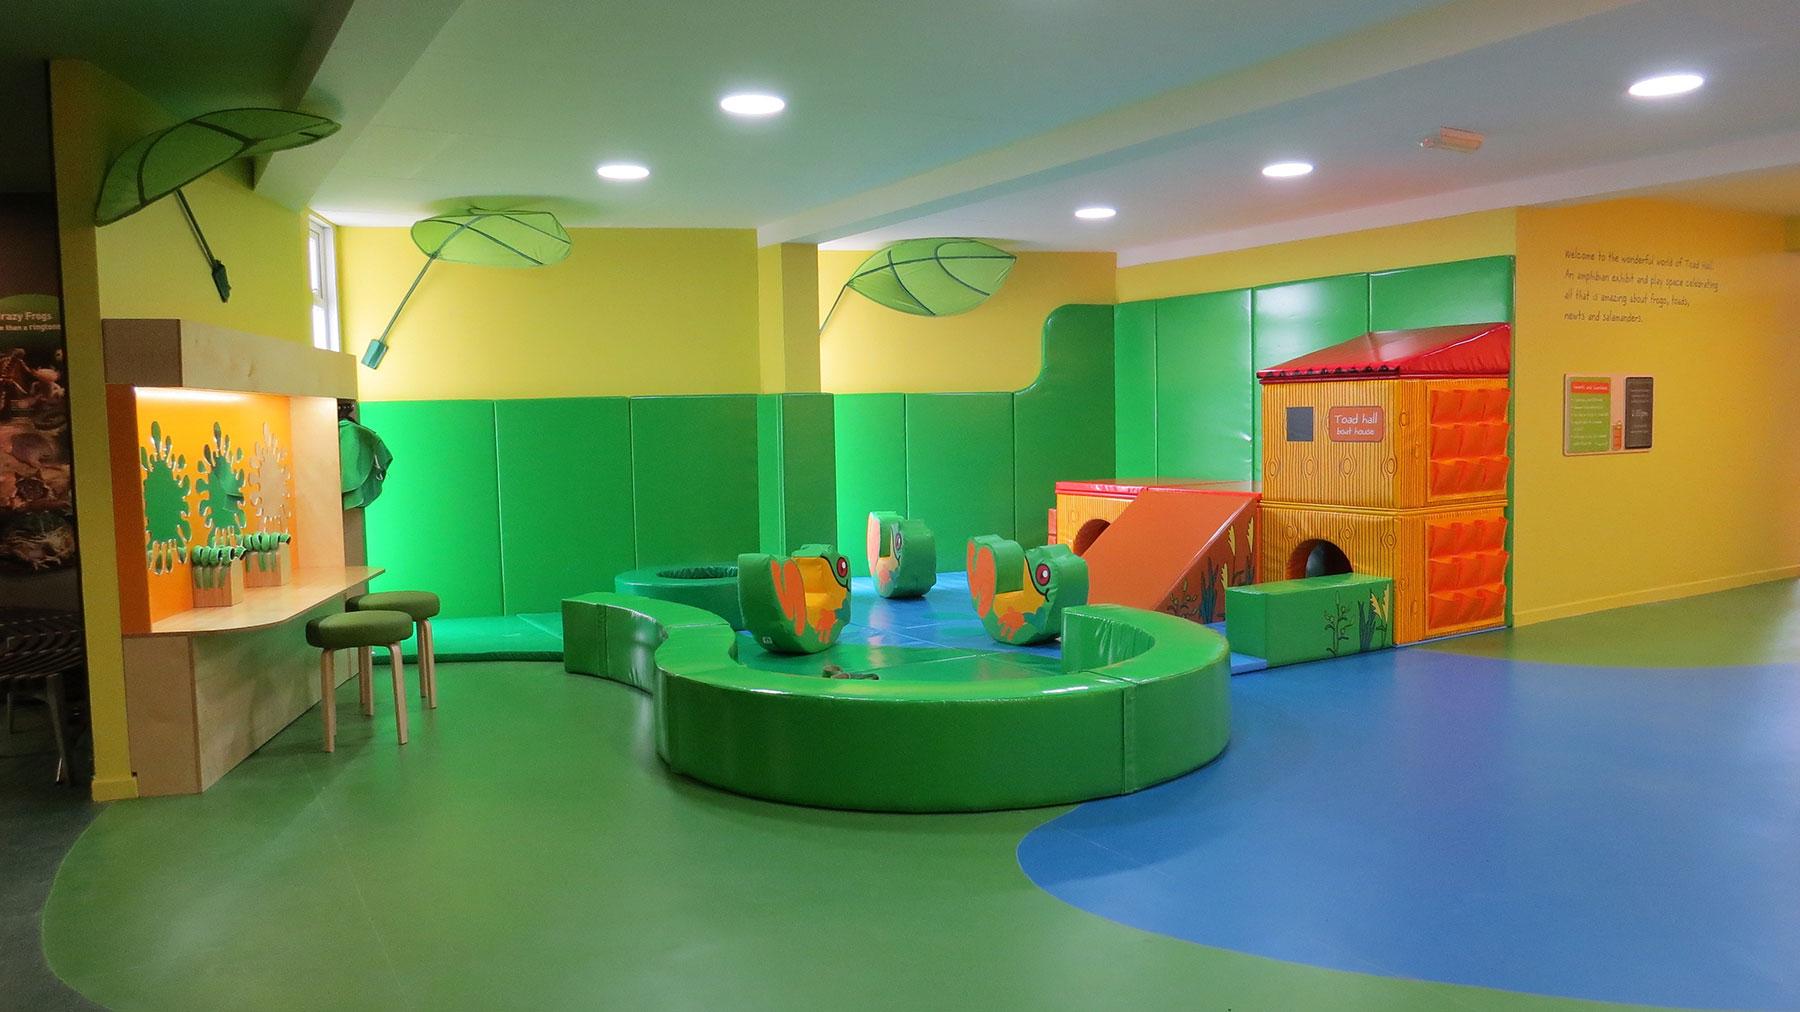 Interpretive games lounge of fun at Toad Hall